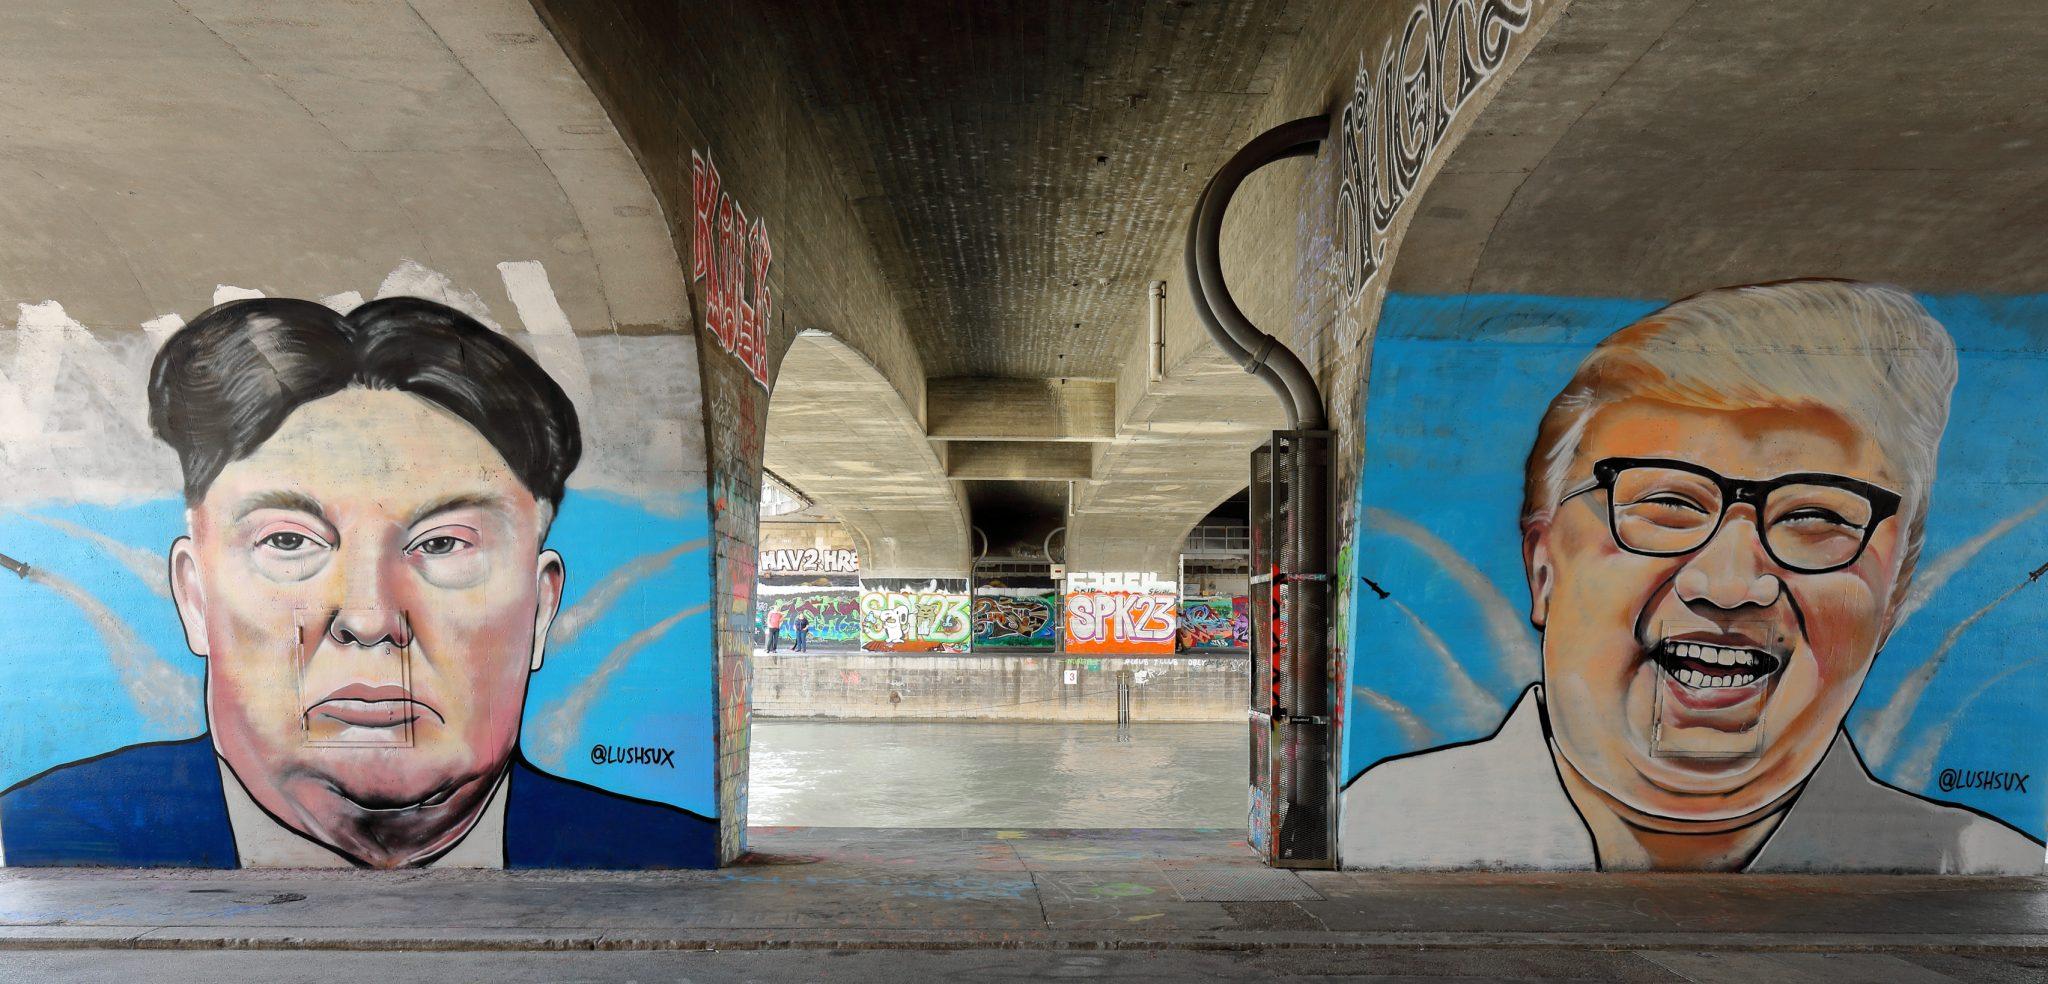 Wien_-_Donald-Trump-_und_Kim-Jong-un-Graffiti_von_Lush_Sux, cc © Bwag/Wikimedia or © Bwag/Commons or © Bwag/CC-BY-SA-4.0